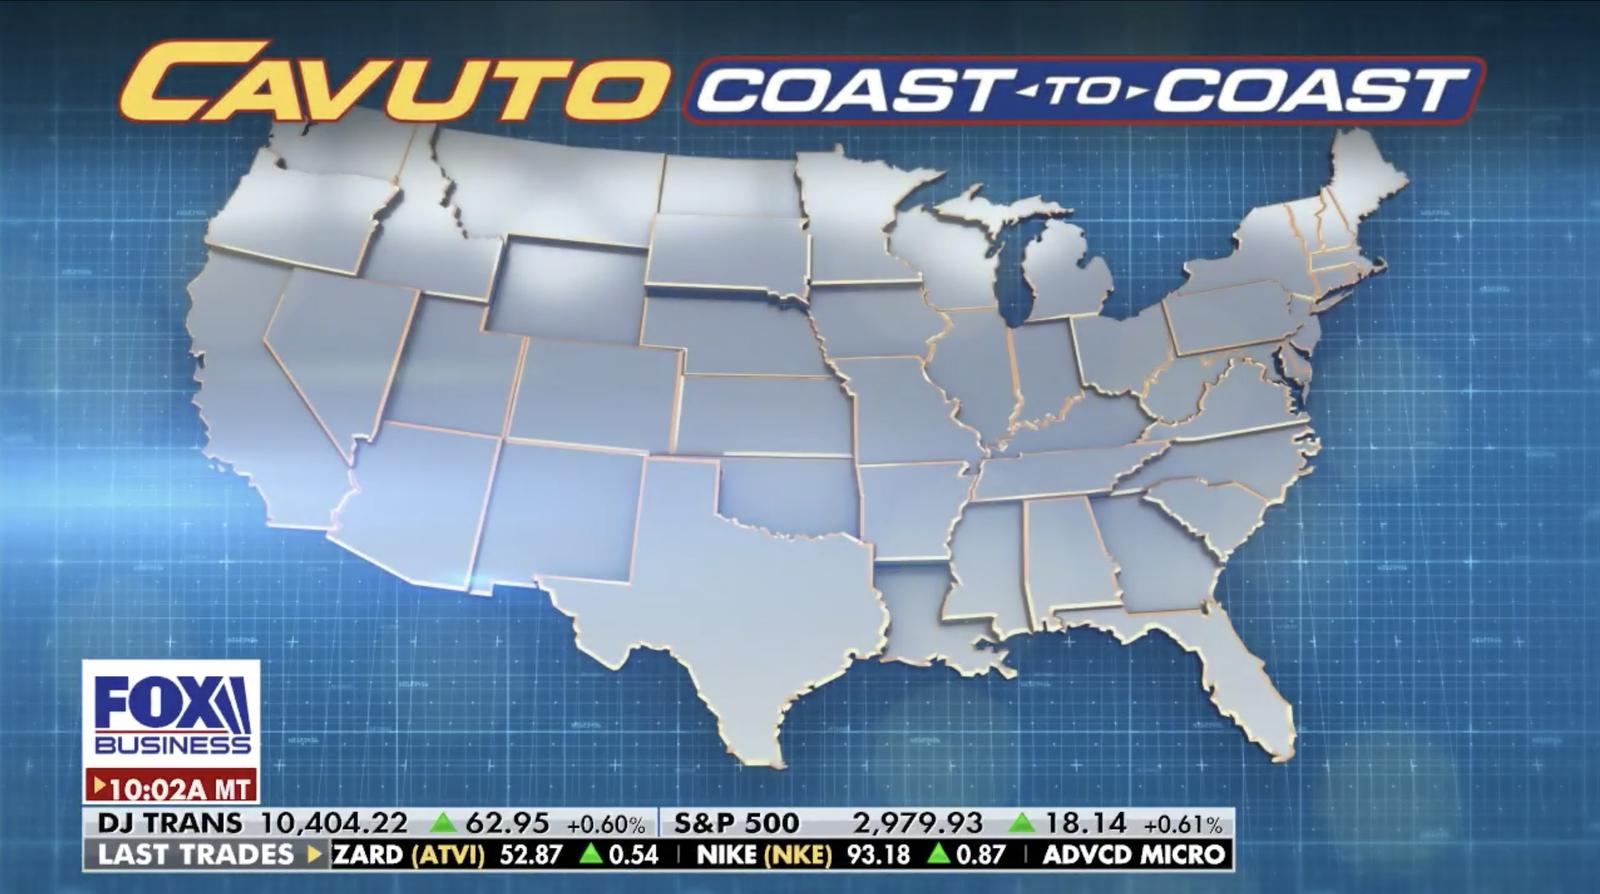 NCS_Fox-Business_Cavuto-Coast-to-Coast_Motion-Graphics_009